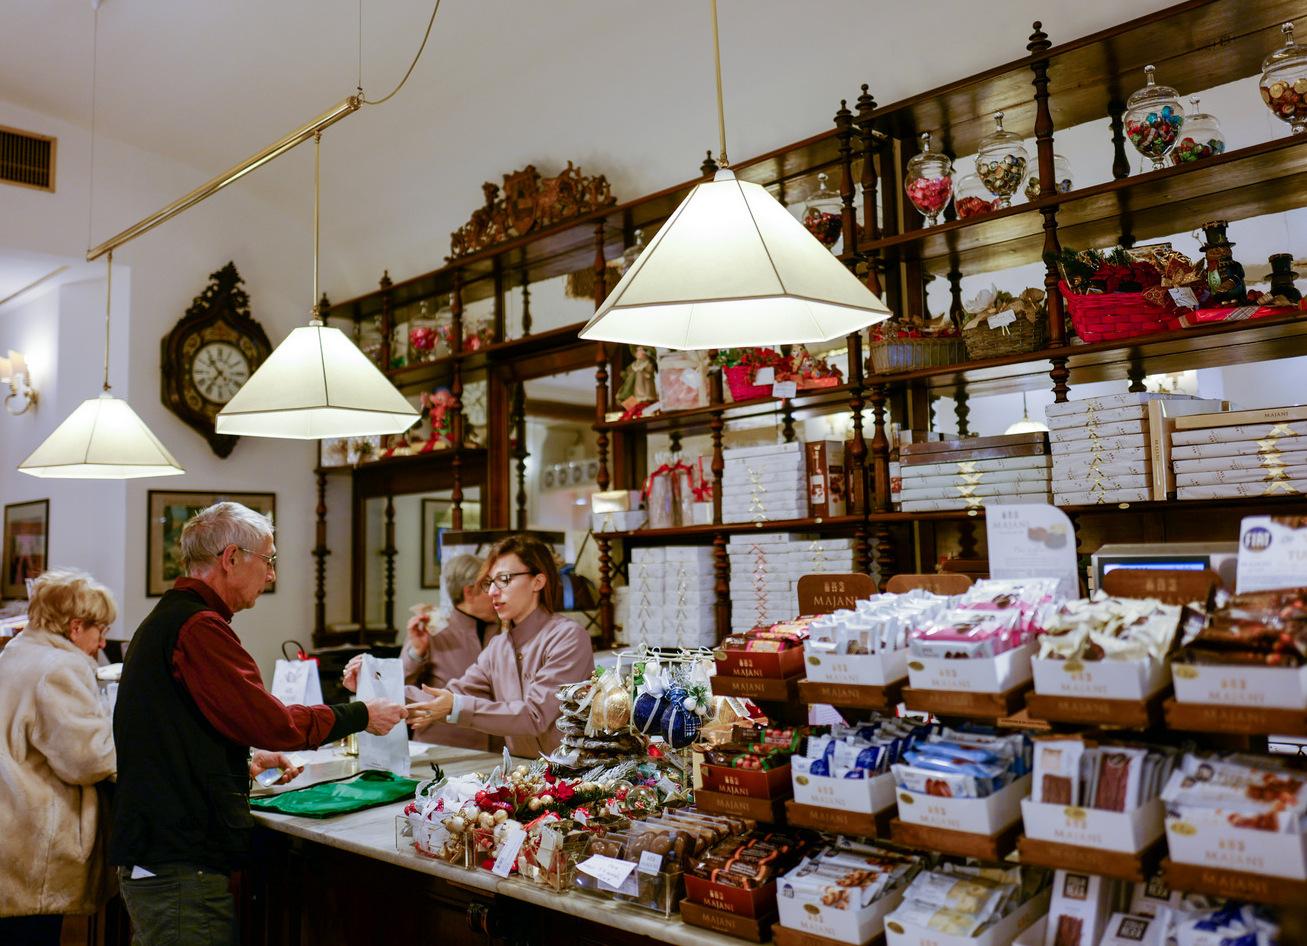 majani chocolates, paolo atti & cremeria funivia, bologna, italy